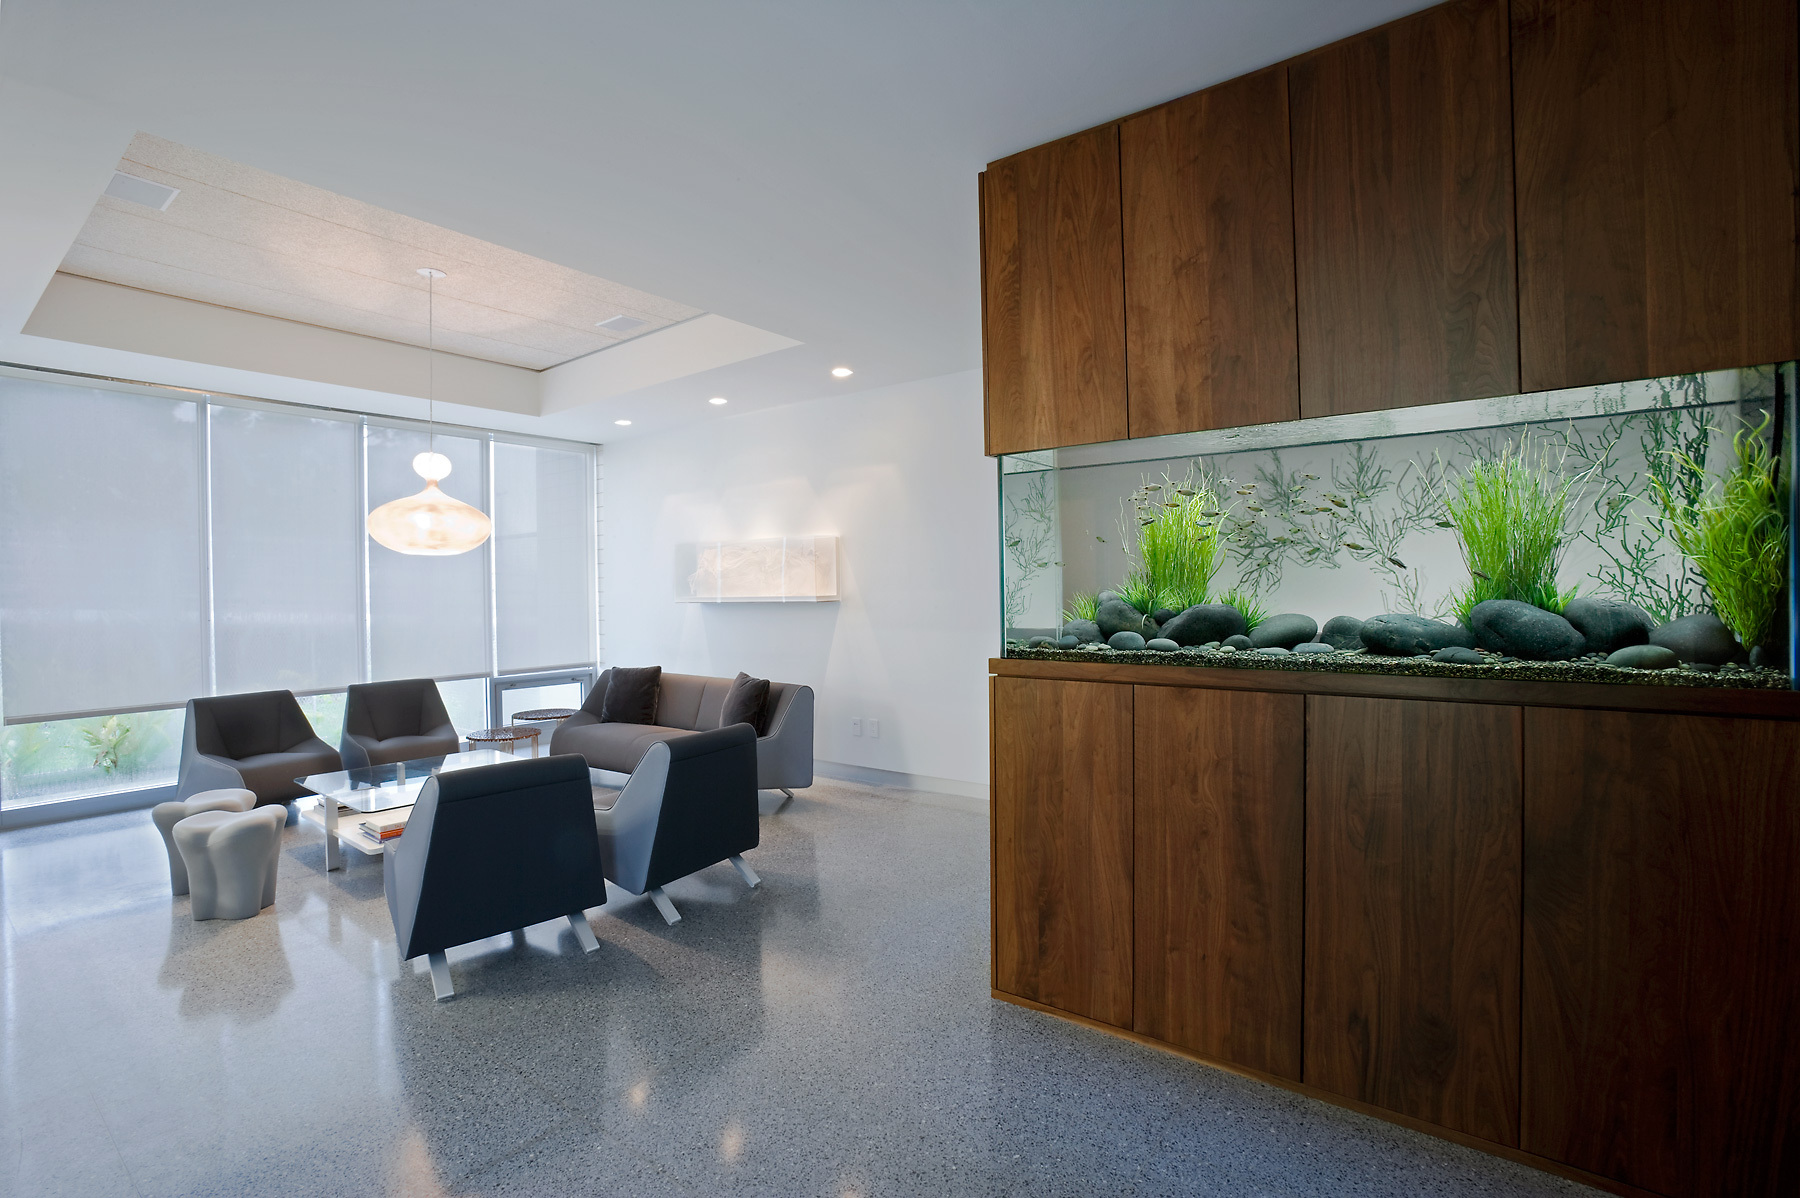 Freshwater Aquarium in a Modern Interior